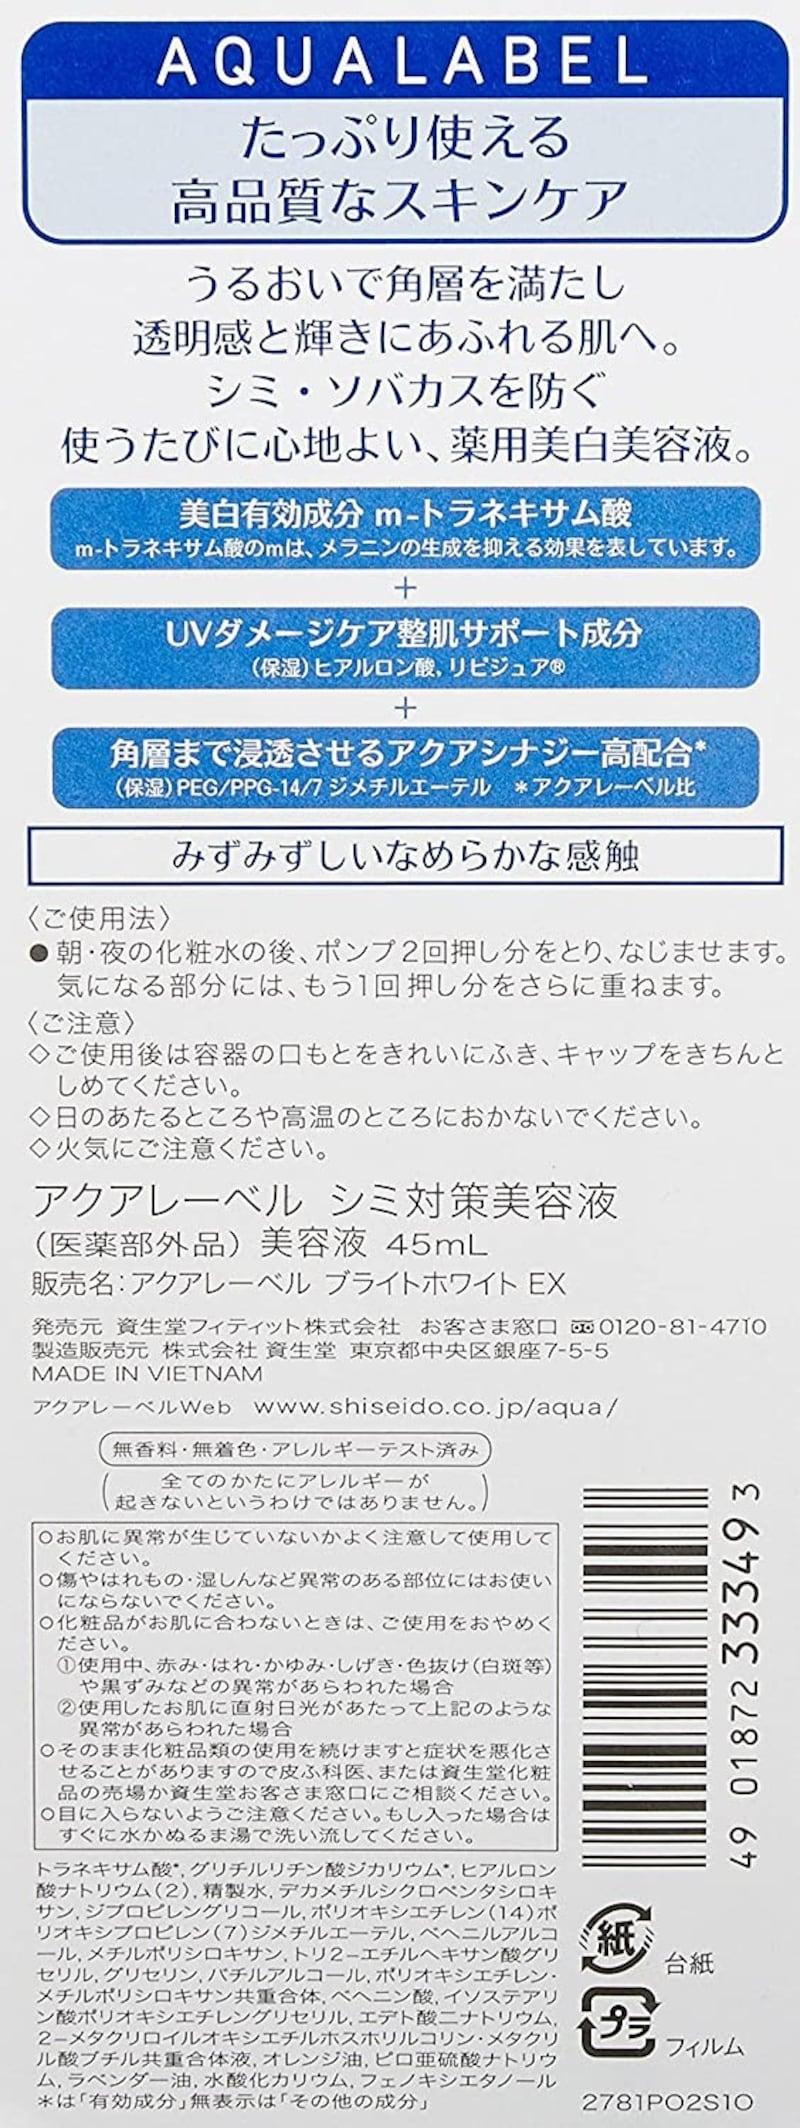 SHISEIDO(資生堂),AQUALABEL(アクアレーベル) シミ対策美容液